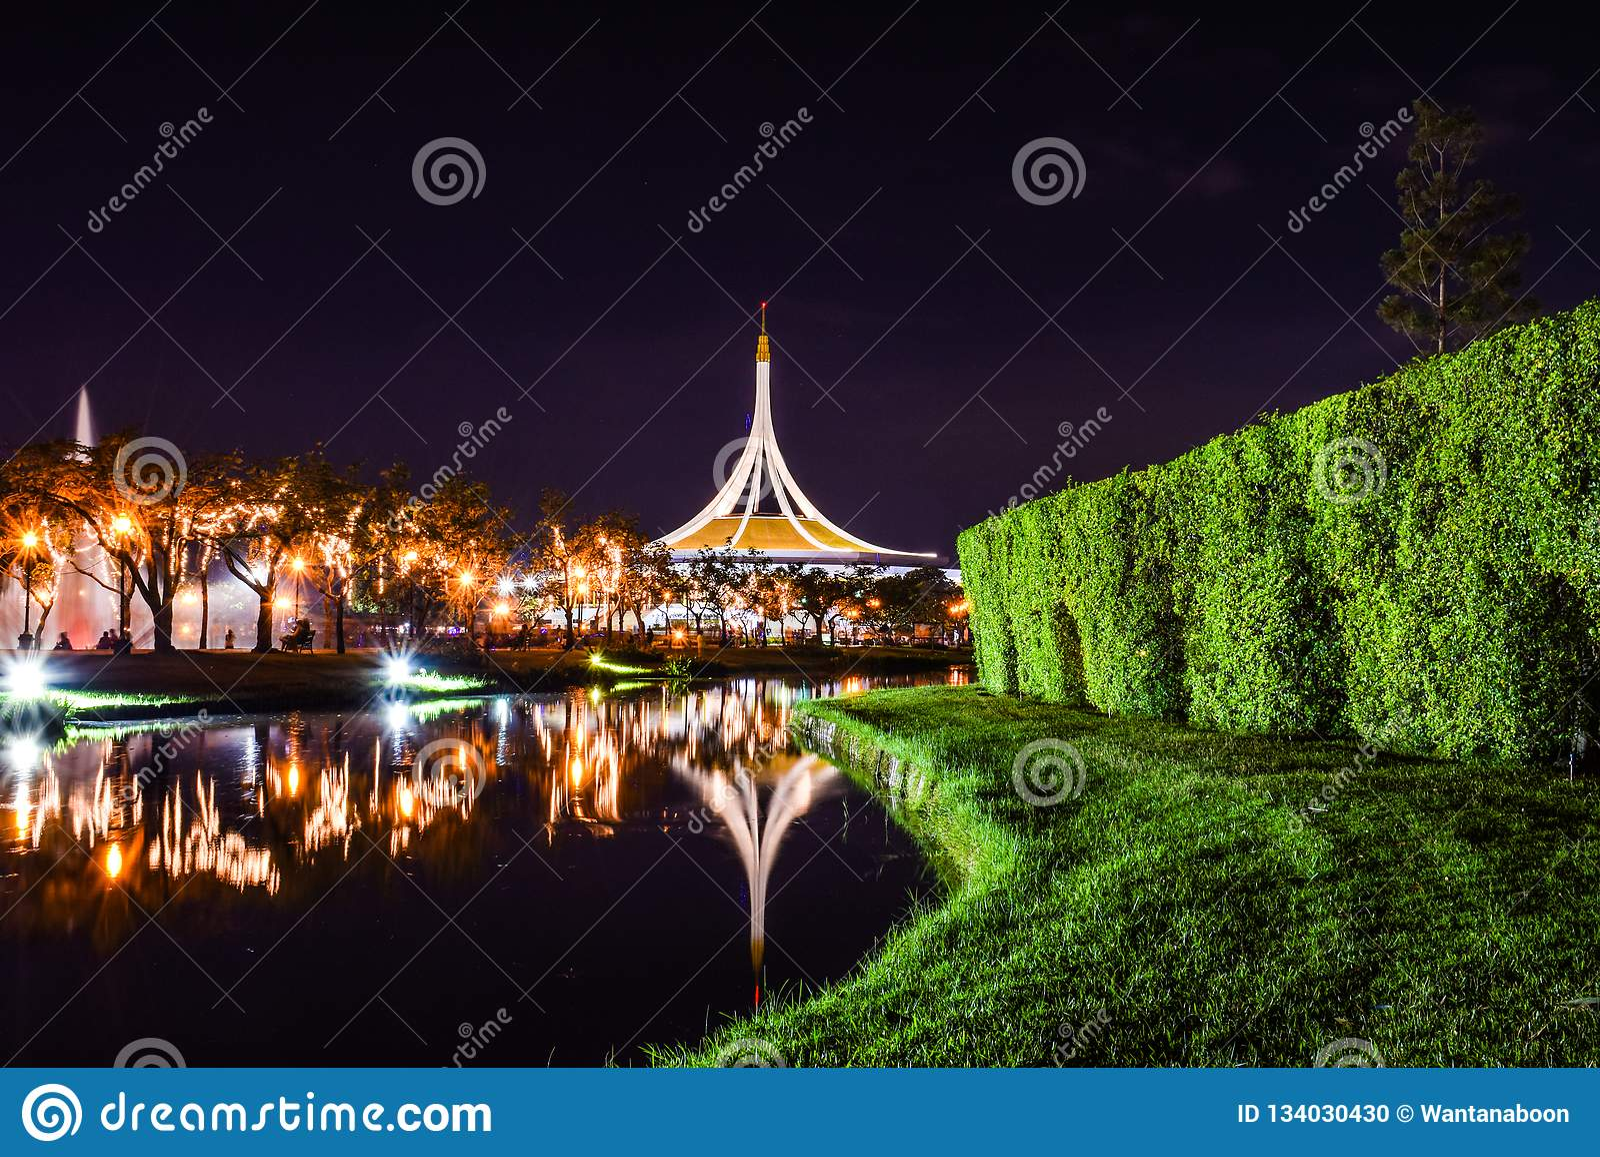 Rajamangala Hall pendant la nuit au parc public